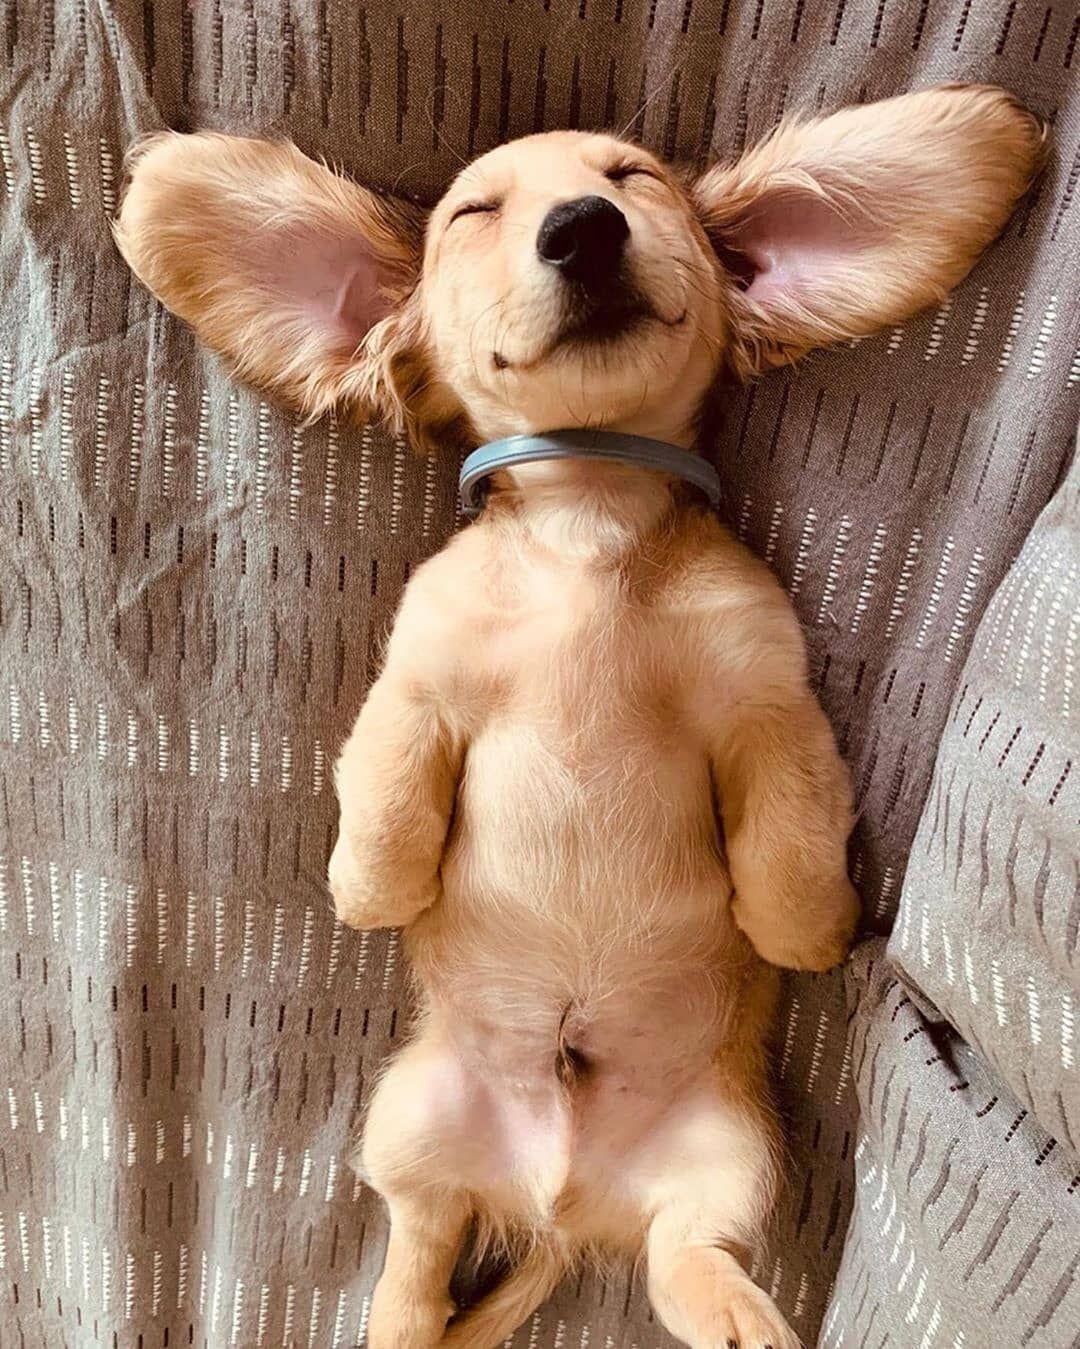 Cute Dachshund Puppy In 2020 Cute Baby Animals Cute Animals Relaxed Dog